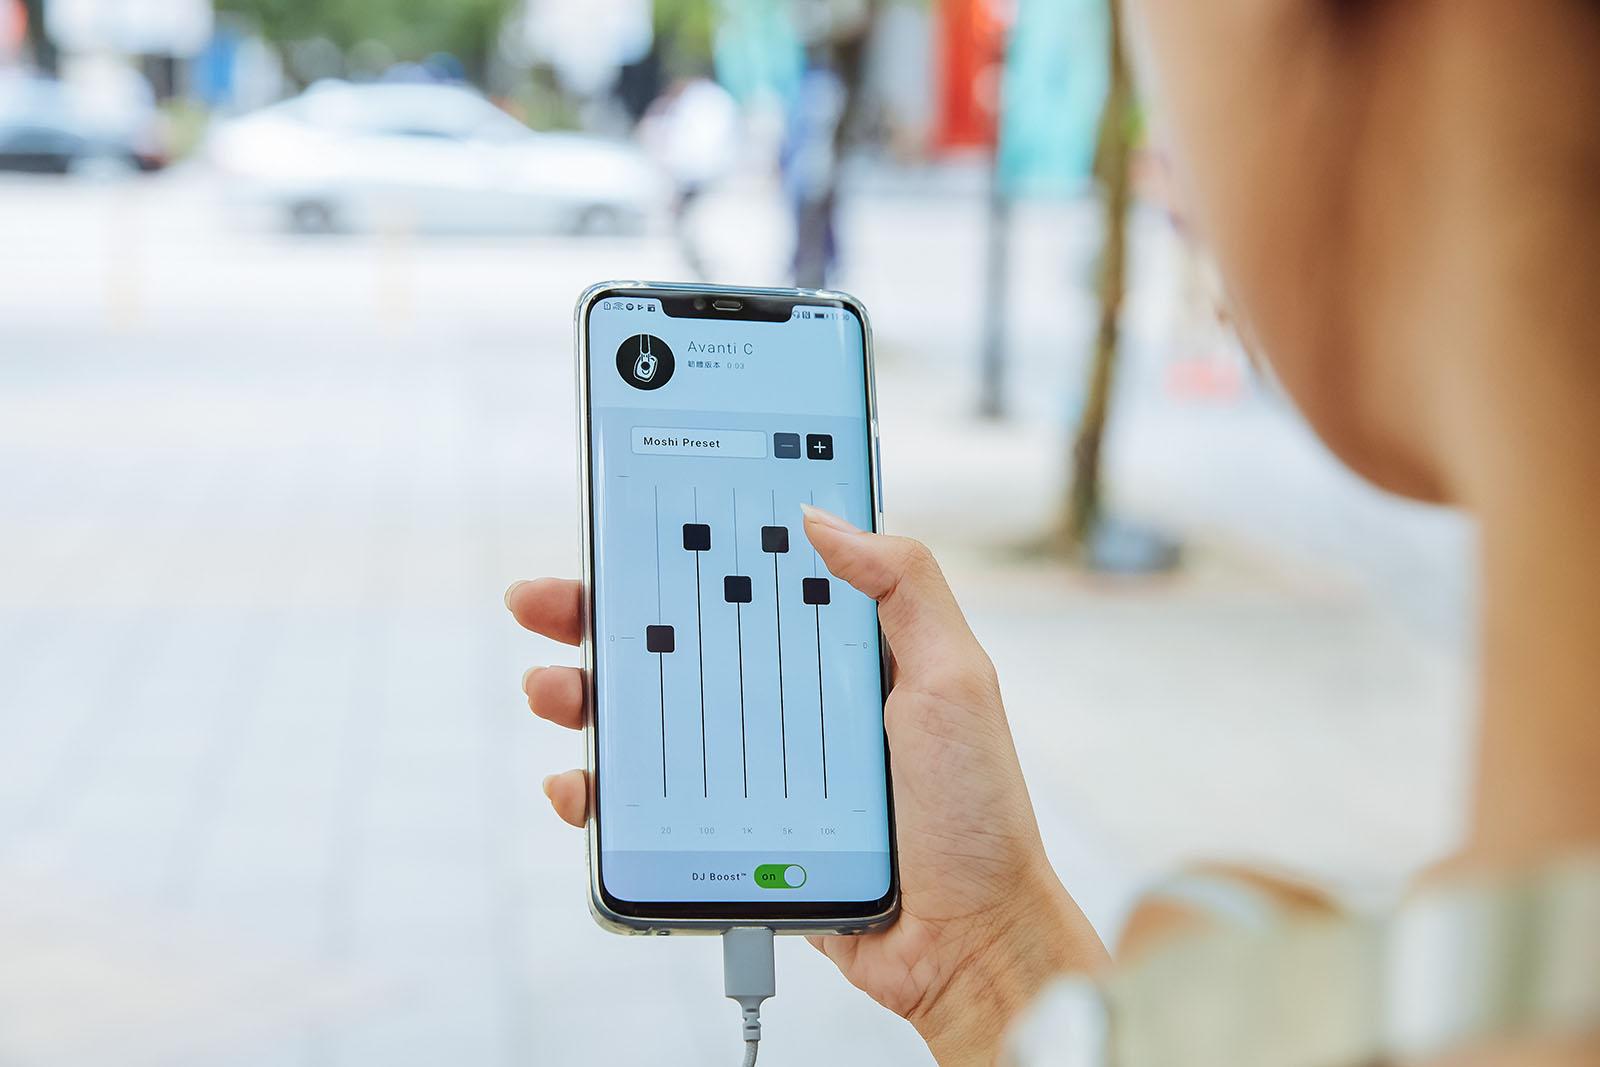 Avanti C 與 Mythro C 都可以透過專屬的「Moshi Digital Audio」App 調校出符合自身喜好的 EQ 音場模式,還可以開啟 DJ Boost 功能進一�優化整體聽感。